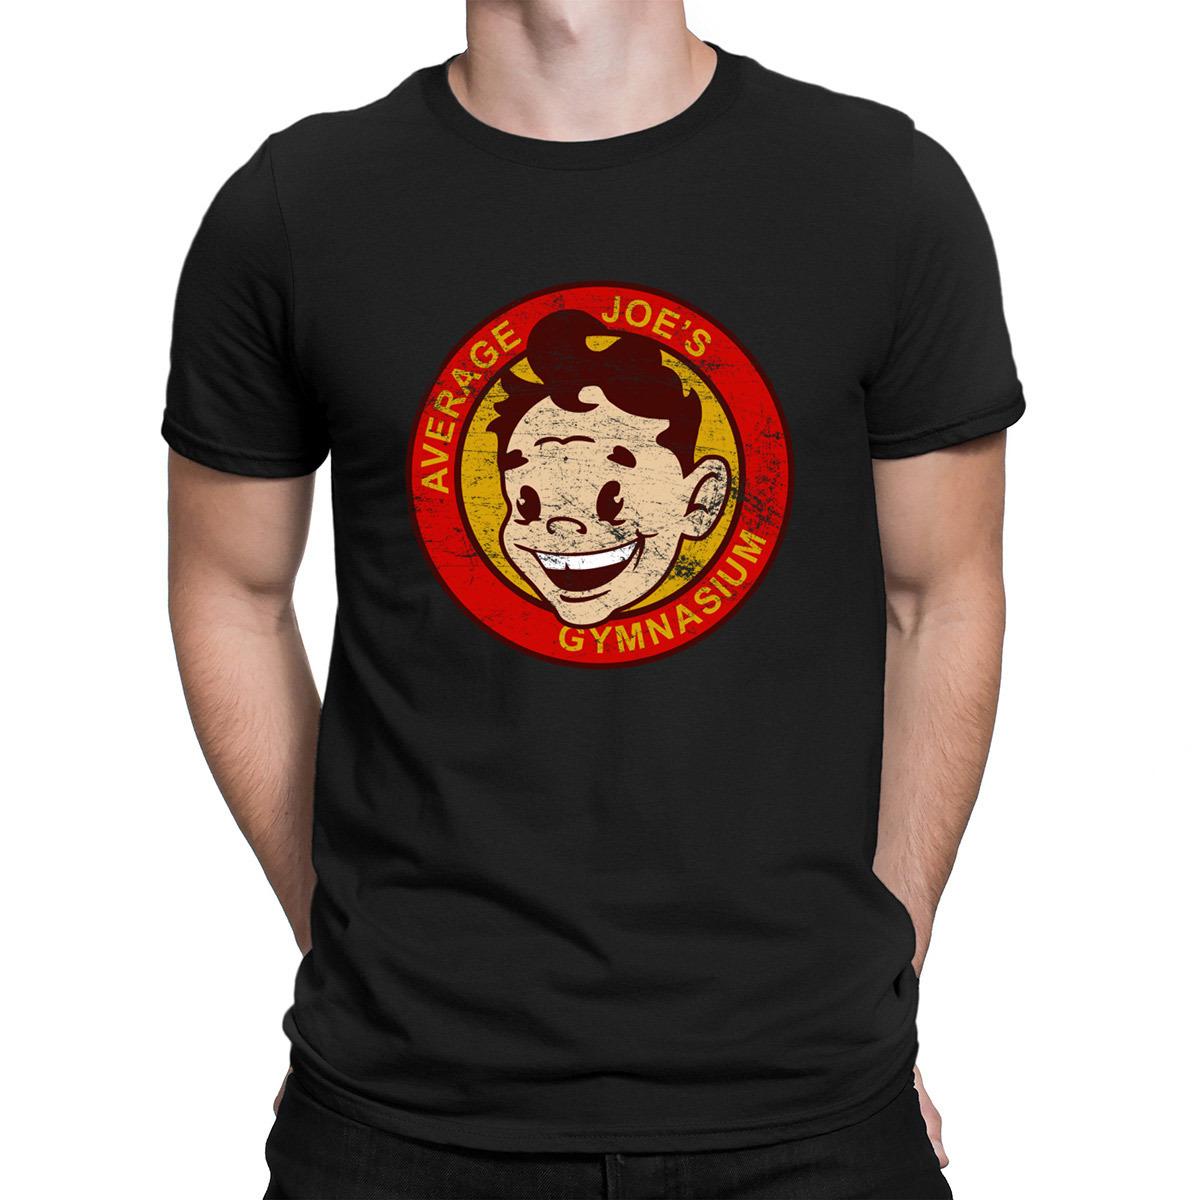 Average Joes Gymnasium Tshirts Pattern Cotton Famous Summer Top T Shirt For Men Designer Weird Spring Autumn Better